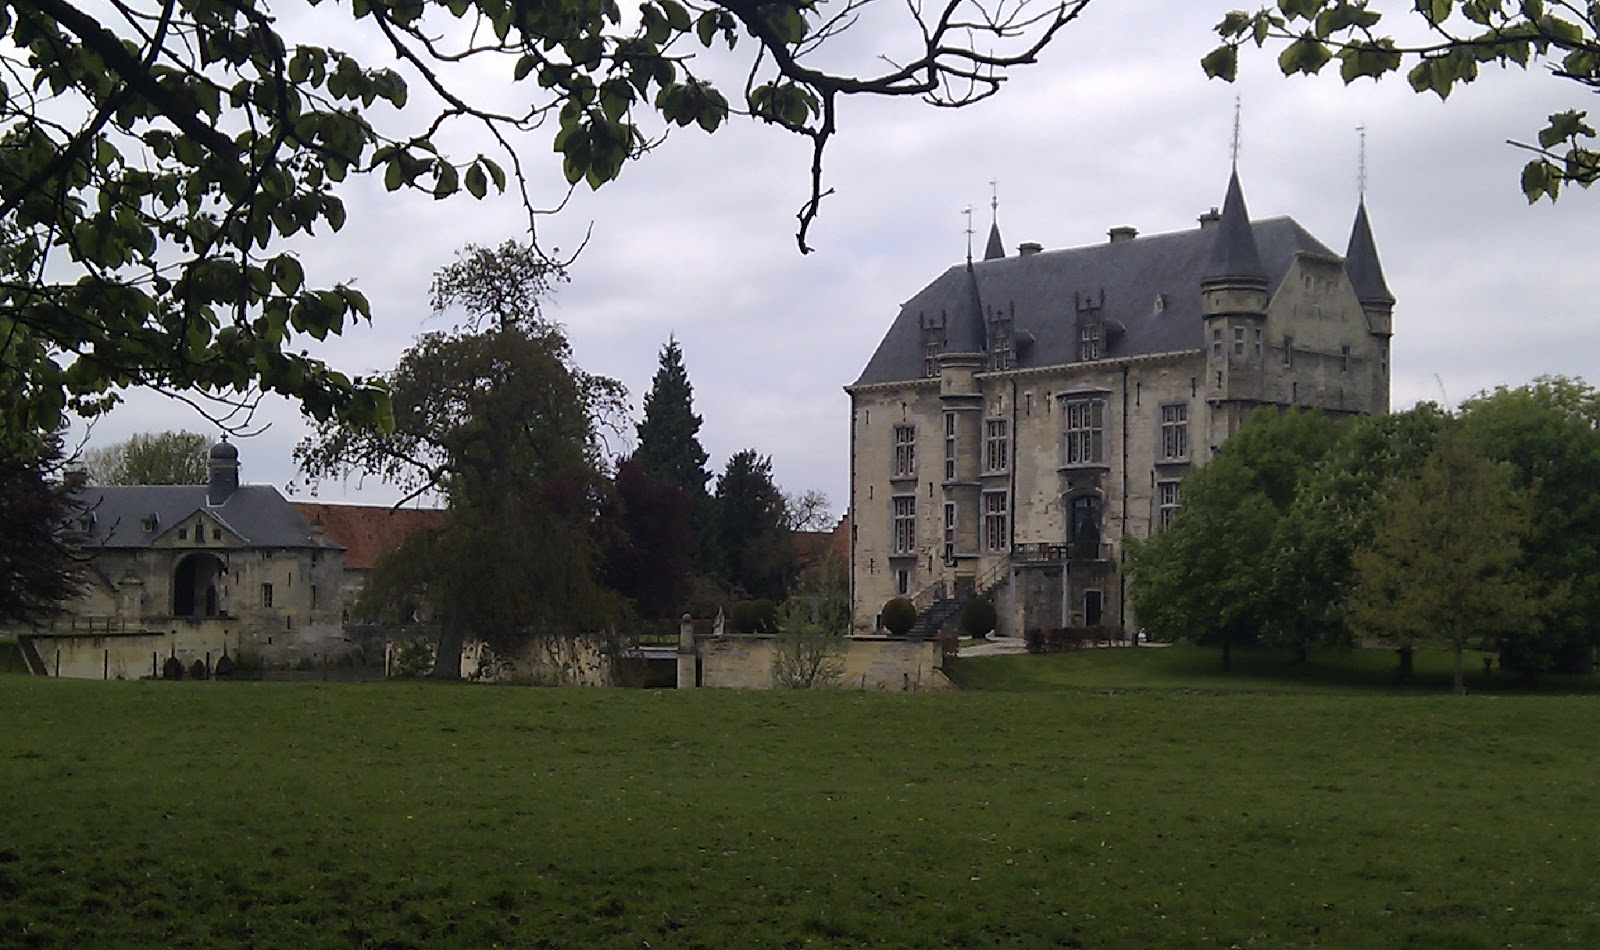 Kasteel Schaloen, Valkenburg, mei 2010: